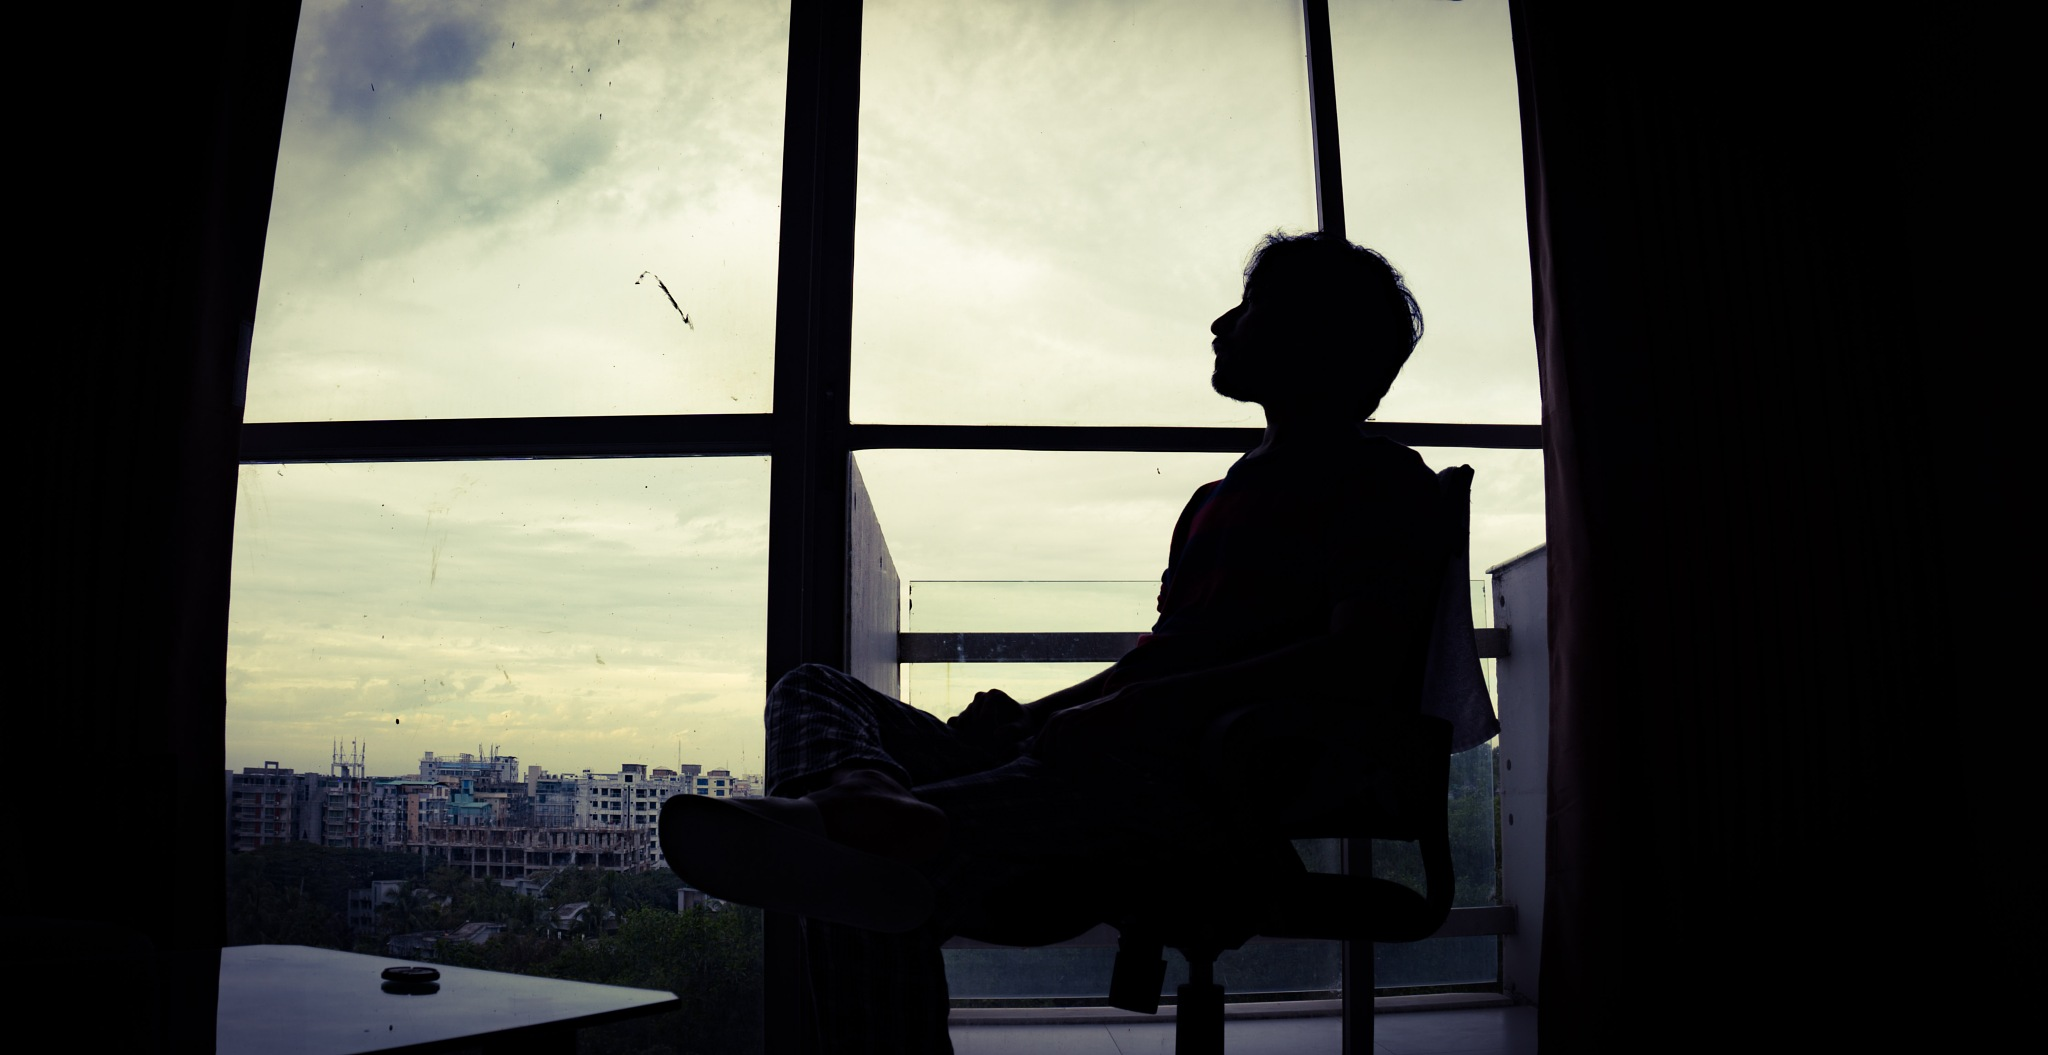 Waiting - 2  by Ahsan Sarawar